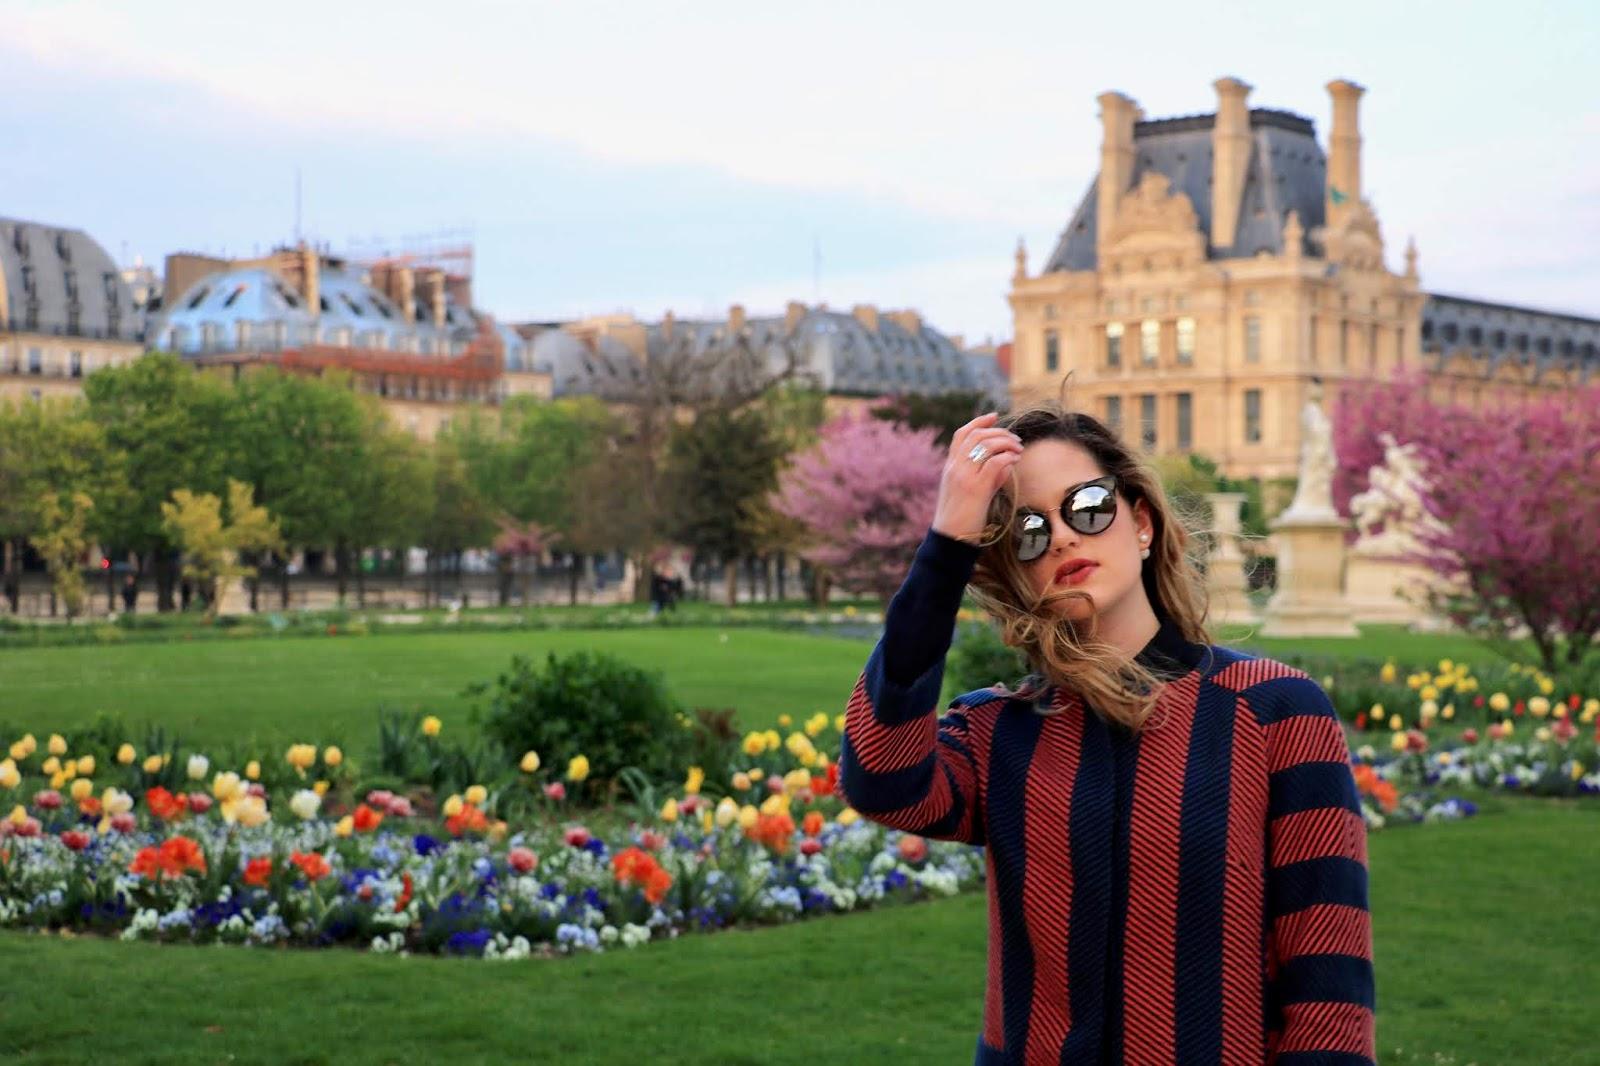 Tuileries Garden Paris April 2019